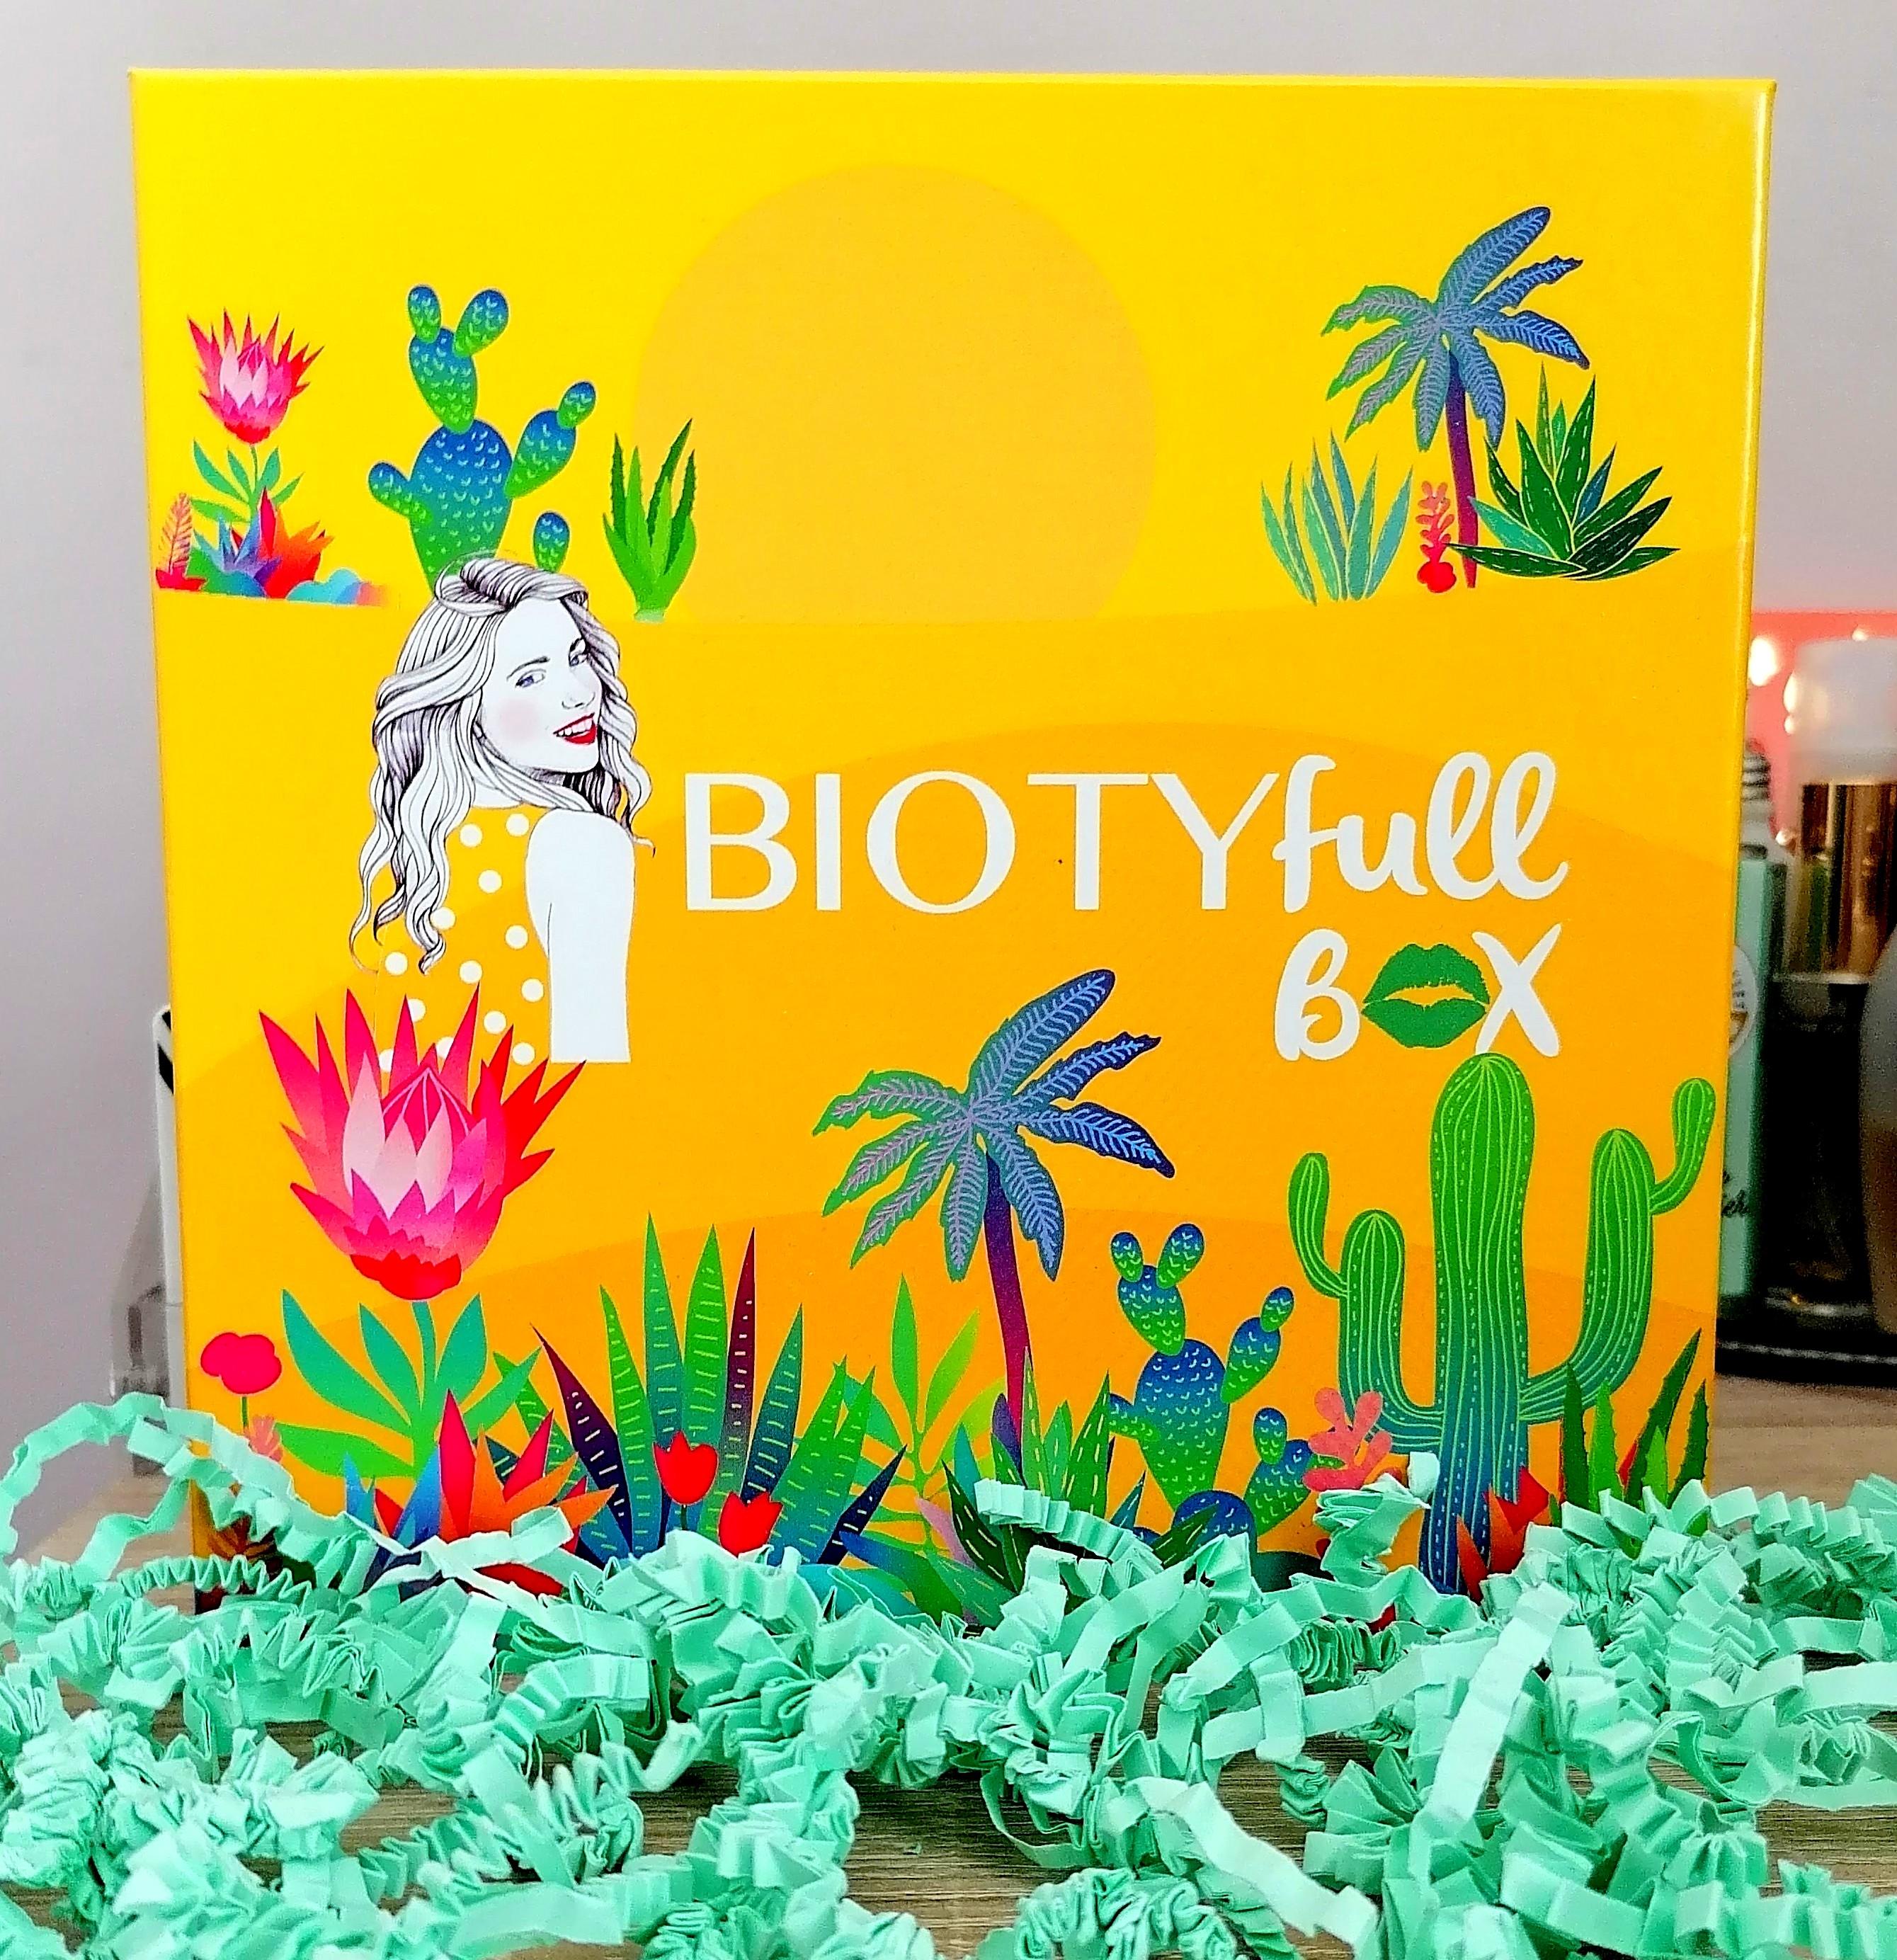 BIOTYFULL BOX Août 2020 : 100% aloe vera!